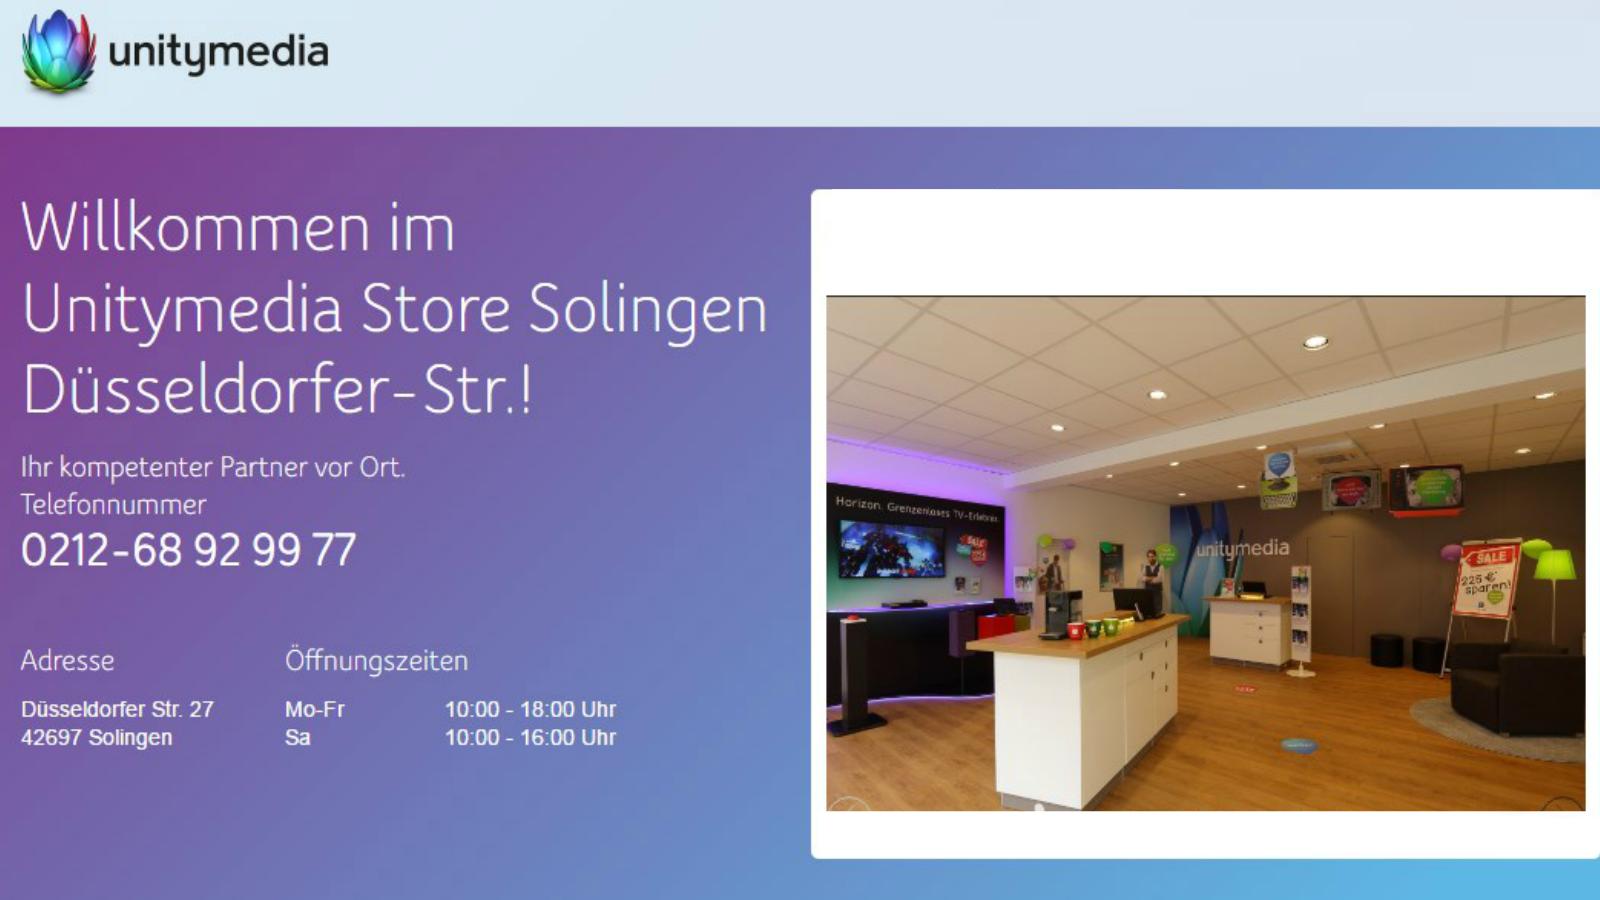 Unitymedia Store Solingen